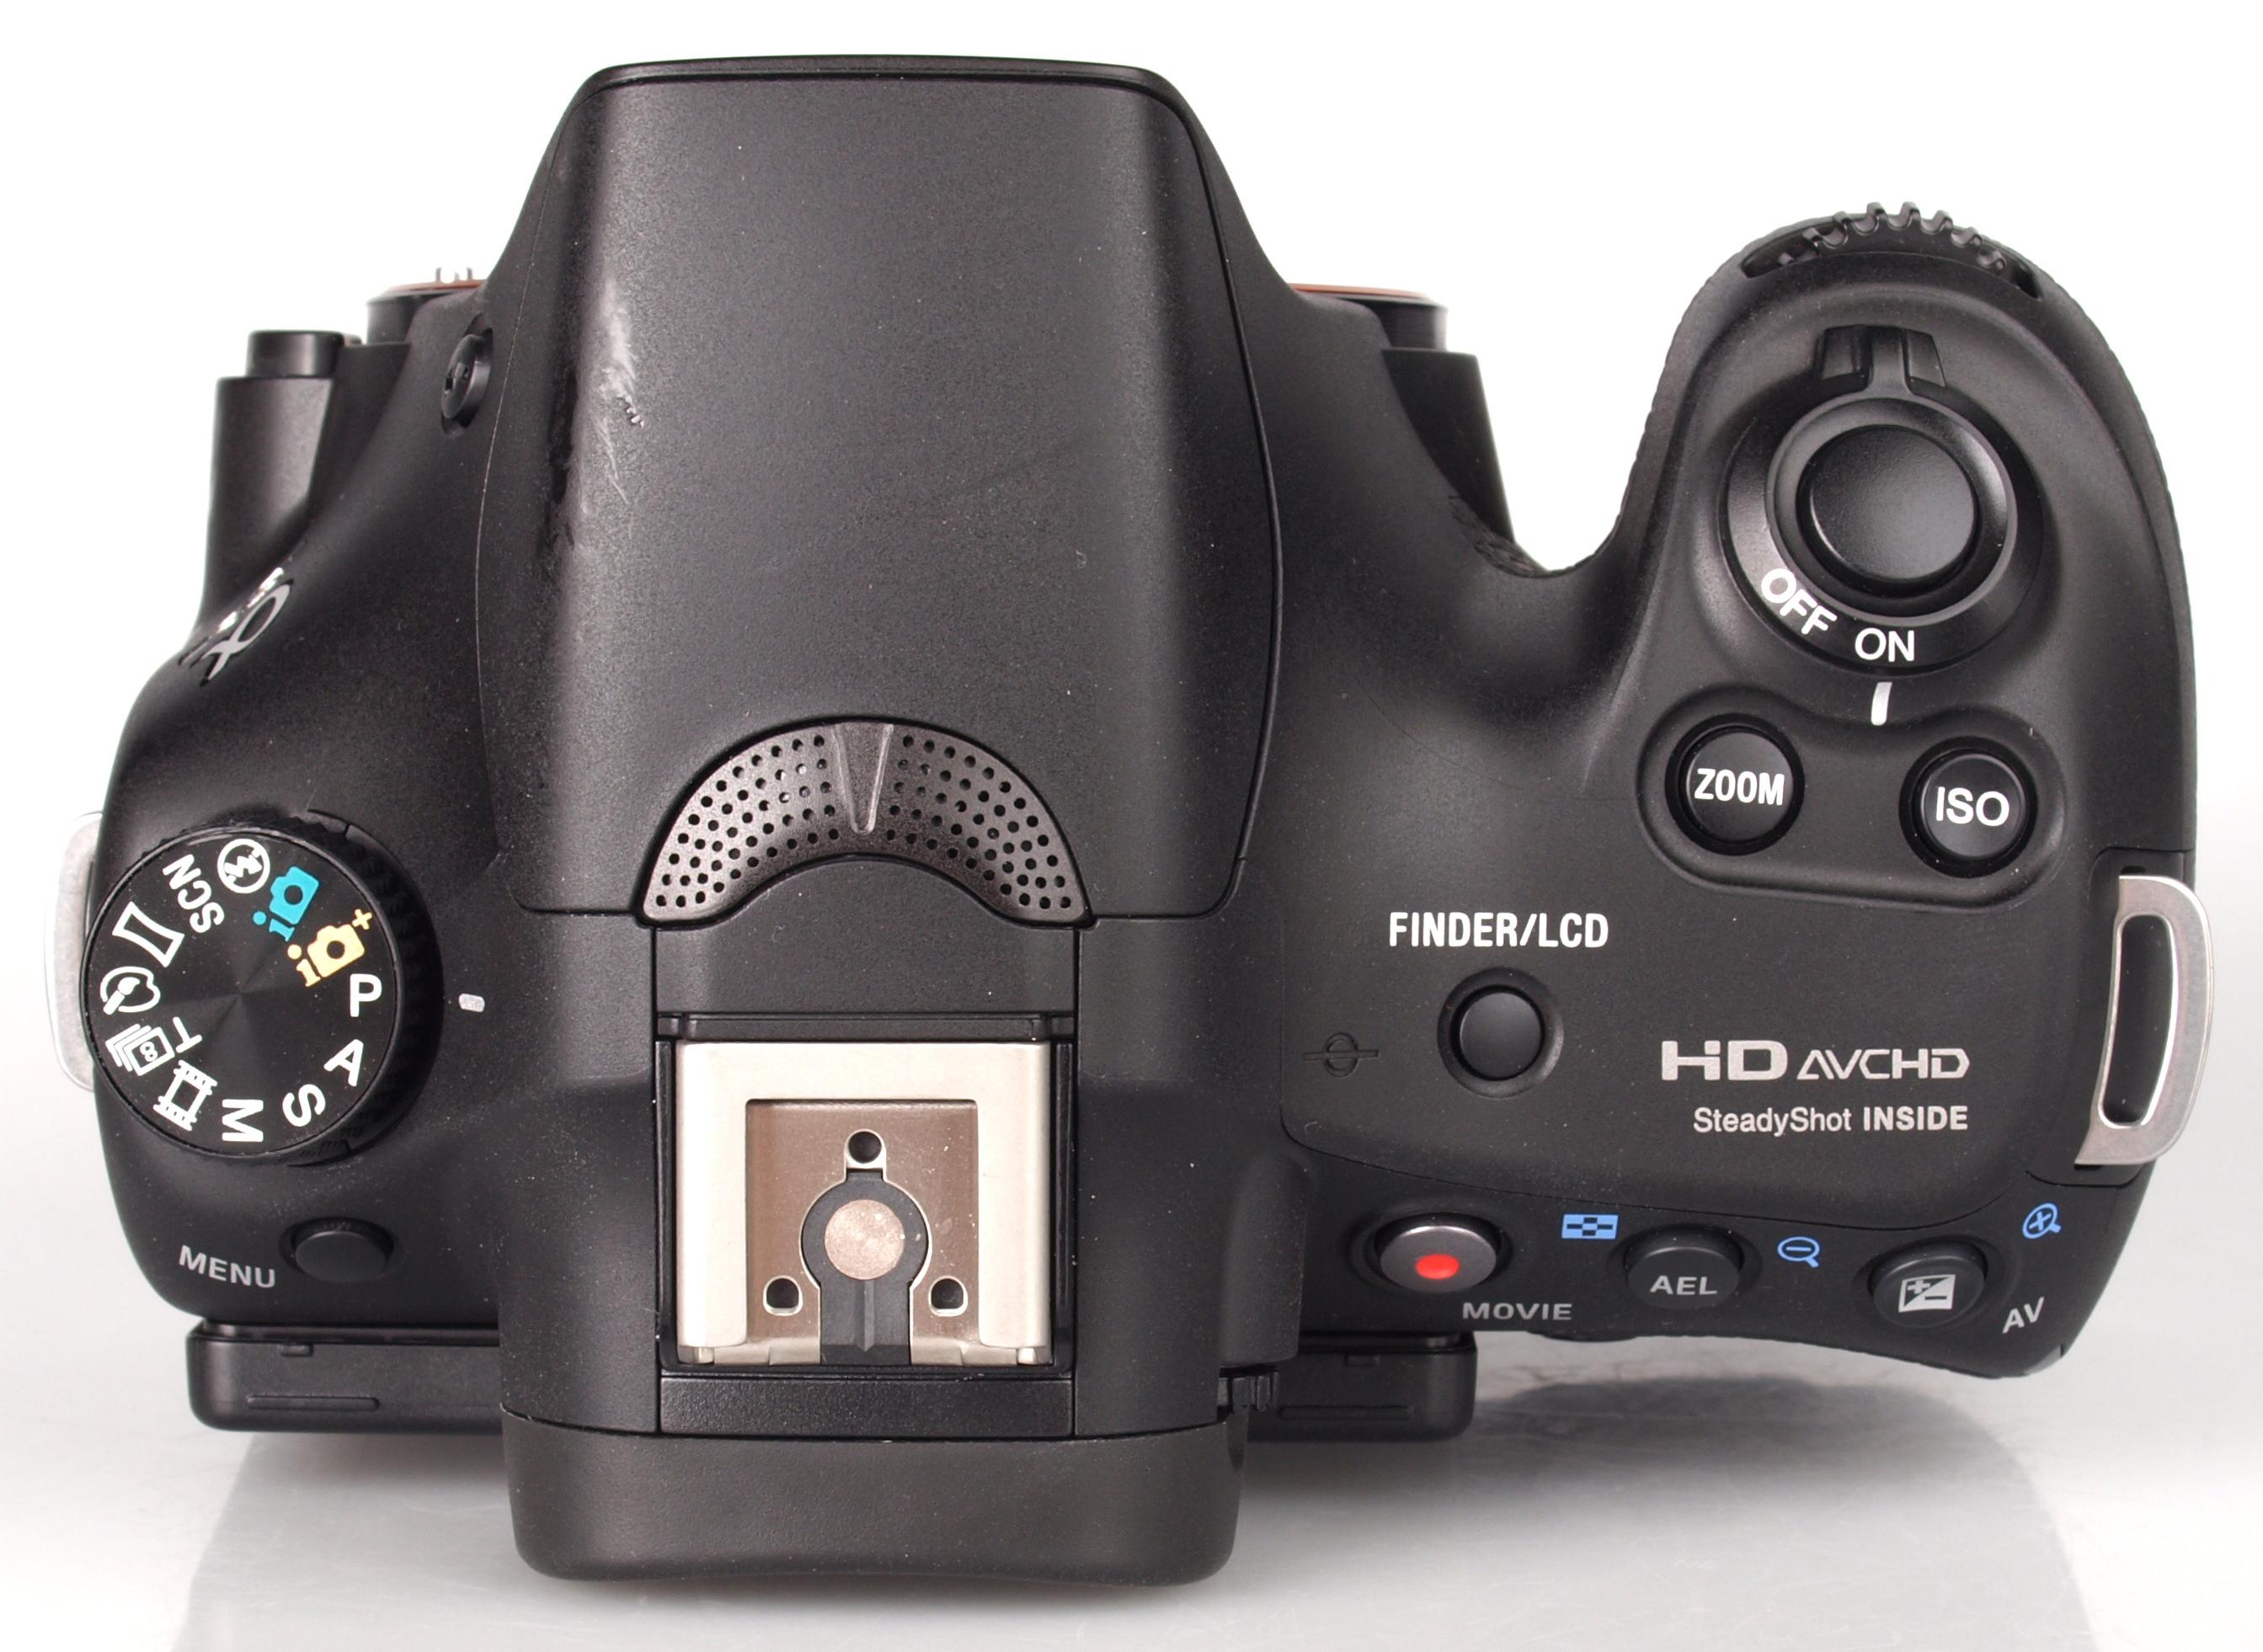 Camera Slt Camera Vs Dslr sony alpha a58 digital slt review dslt 14